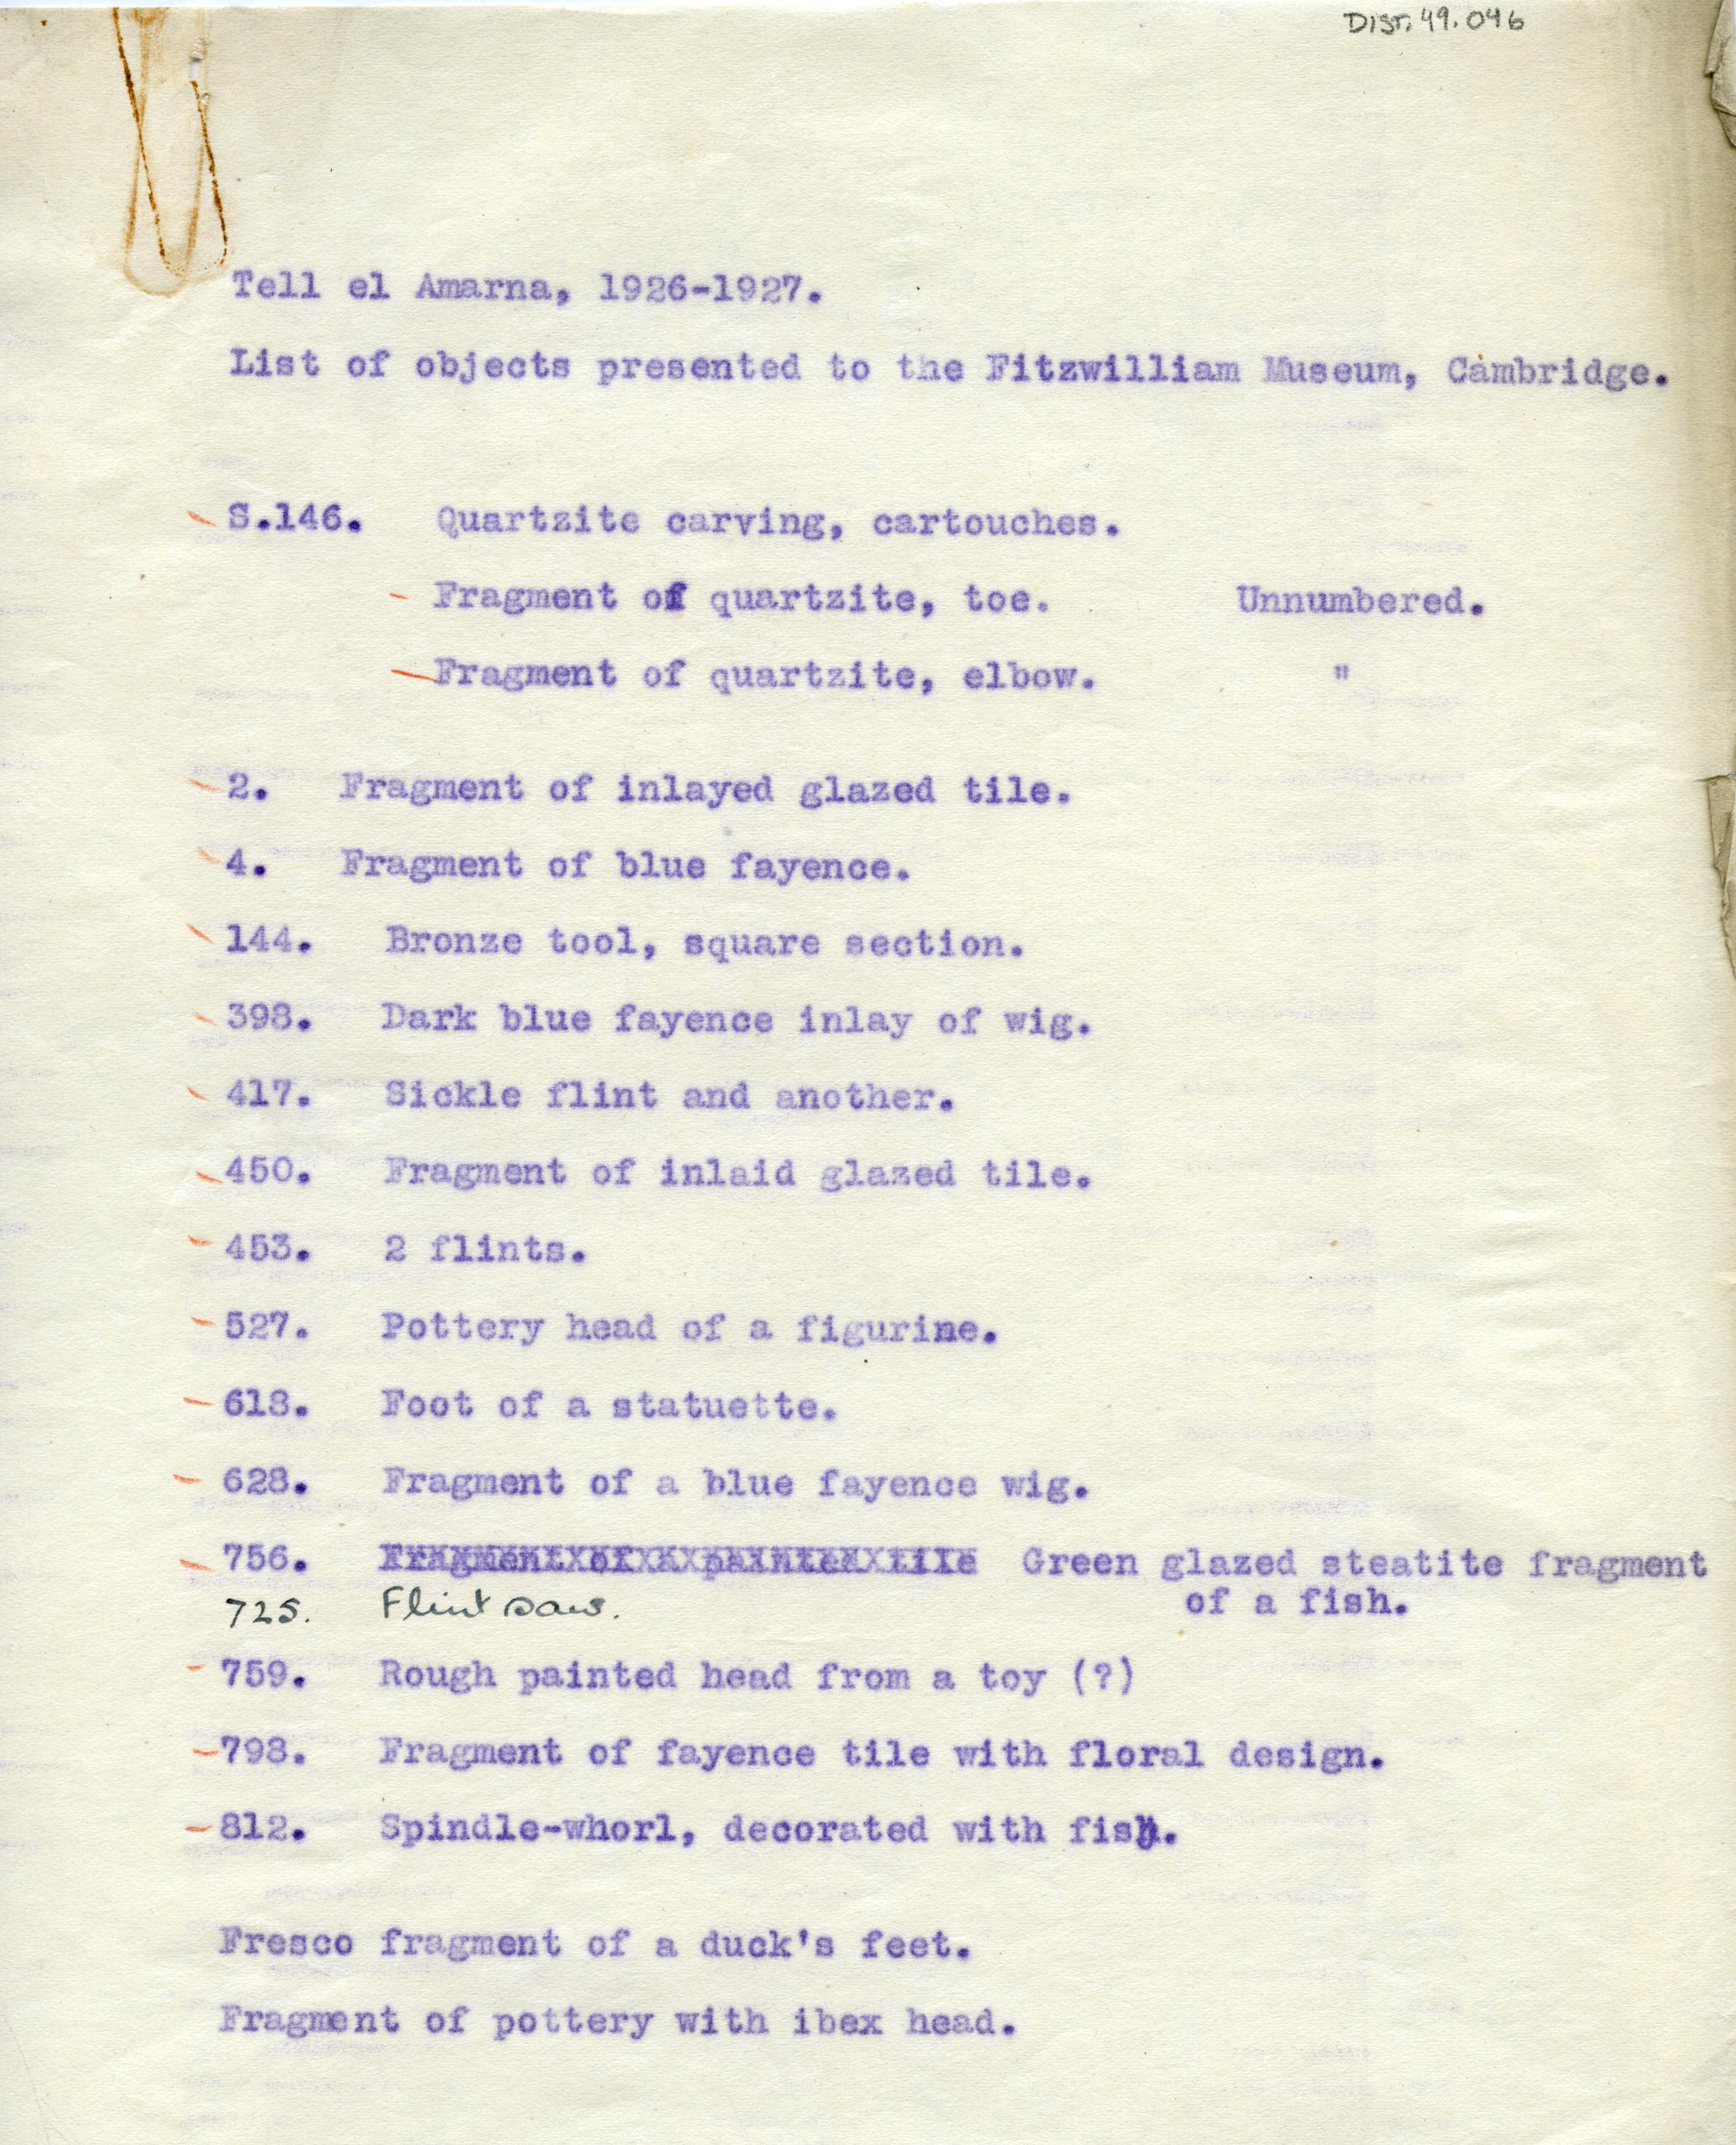 1926-27 el-Amarna DIST.49.046